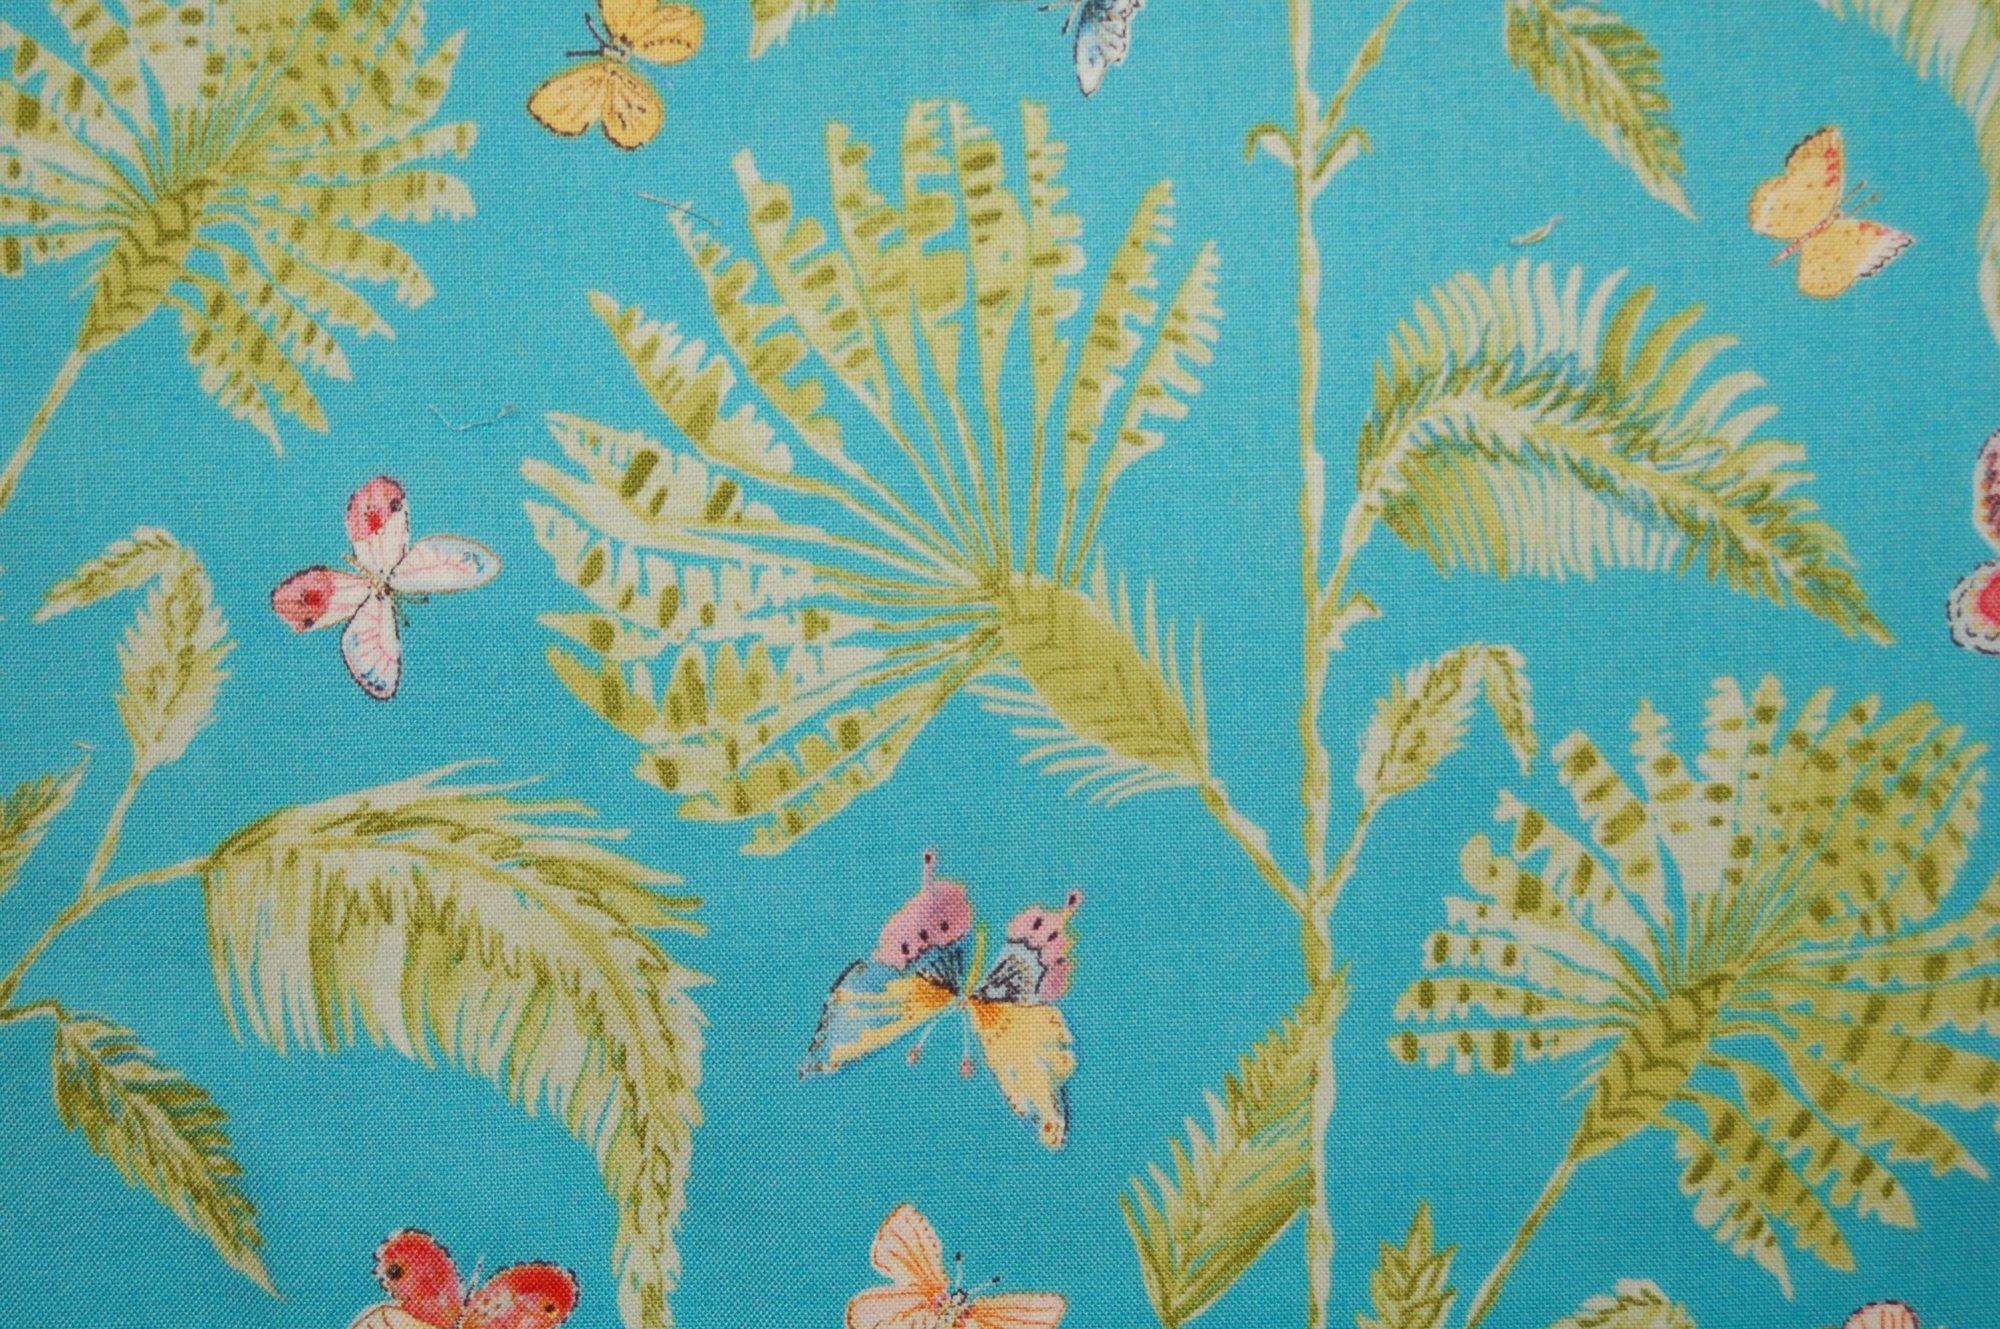 Butterfly Garden - Butterfly Palm from Dena Designs for Free Spirit